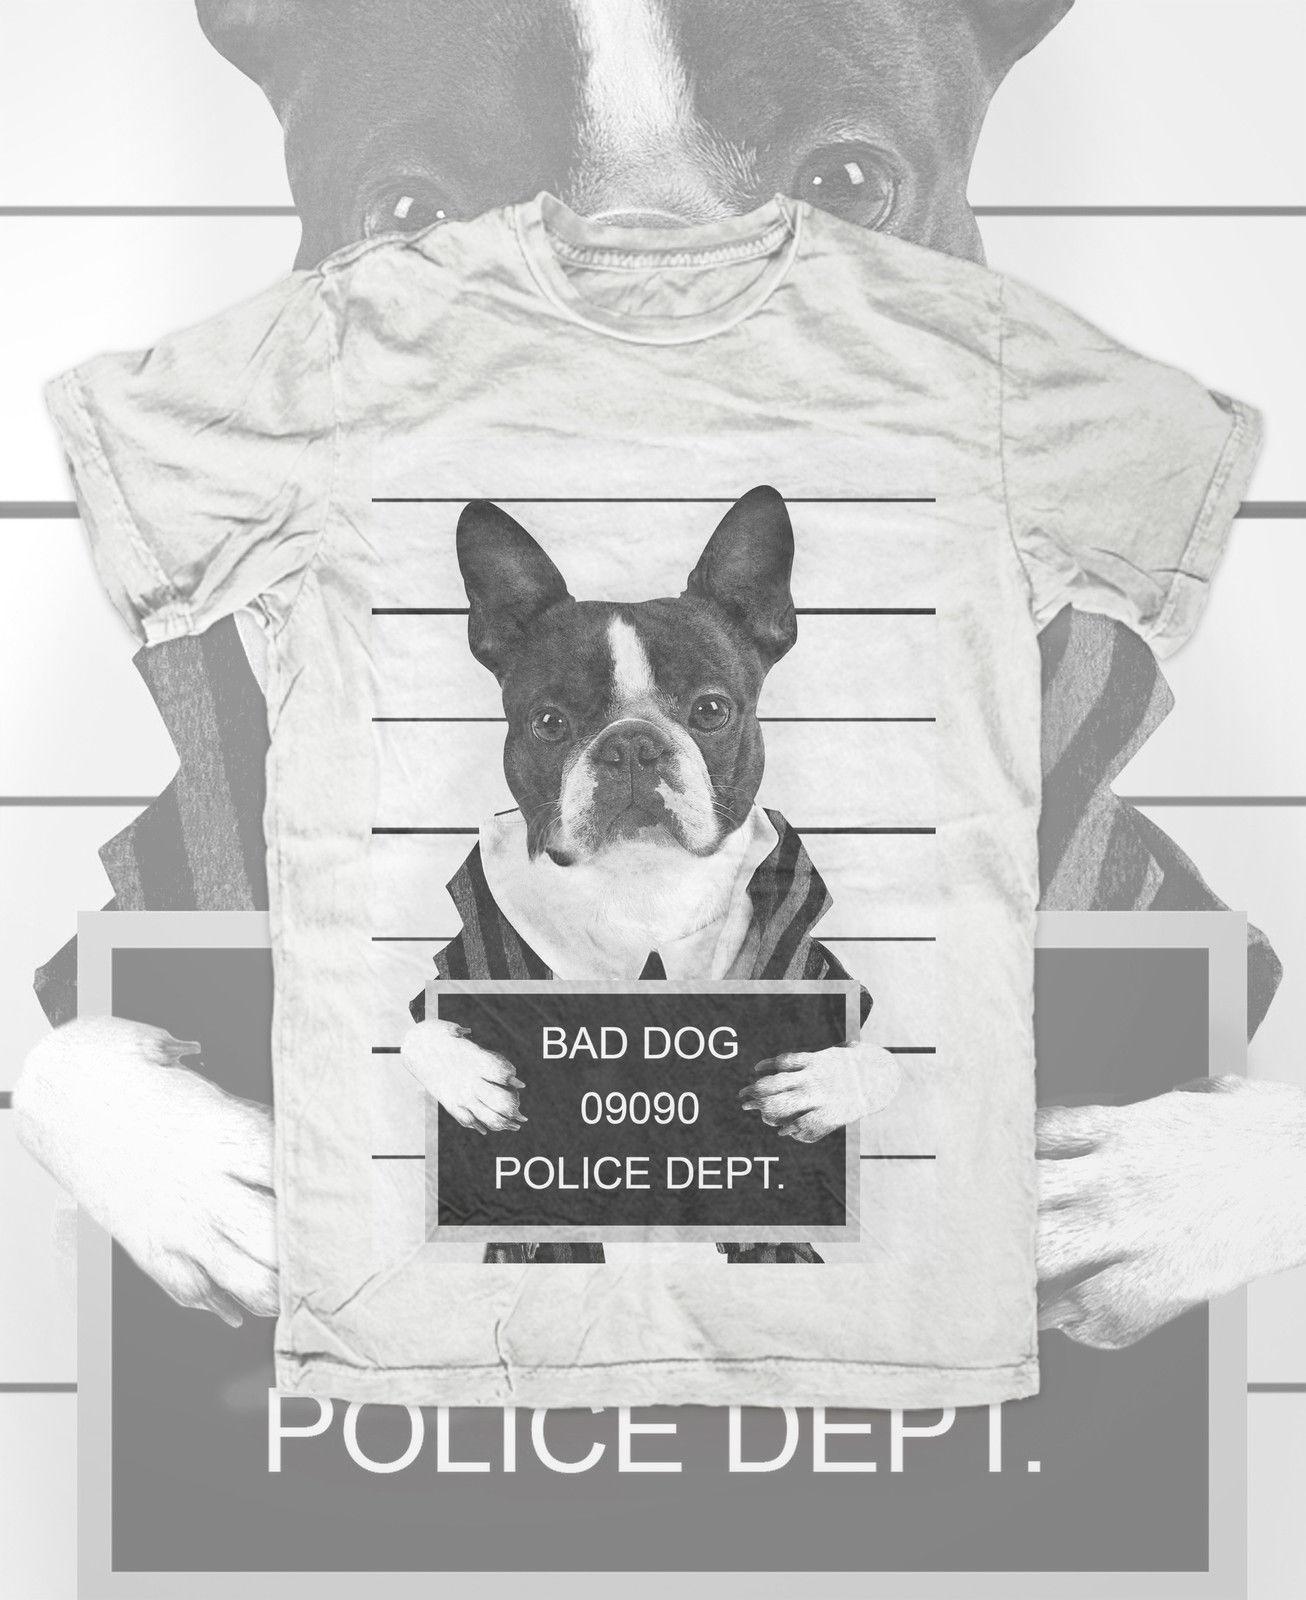 Französische Bulldogge Mugshot T Shirt Weiss Hund Dog French Bulldog  Frenchi Mens Pride Dark T Shirt Daily Tee Shirts Coolest Shirt From  Qqq1510488977, ... b2e5cdca06